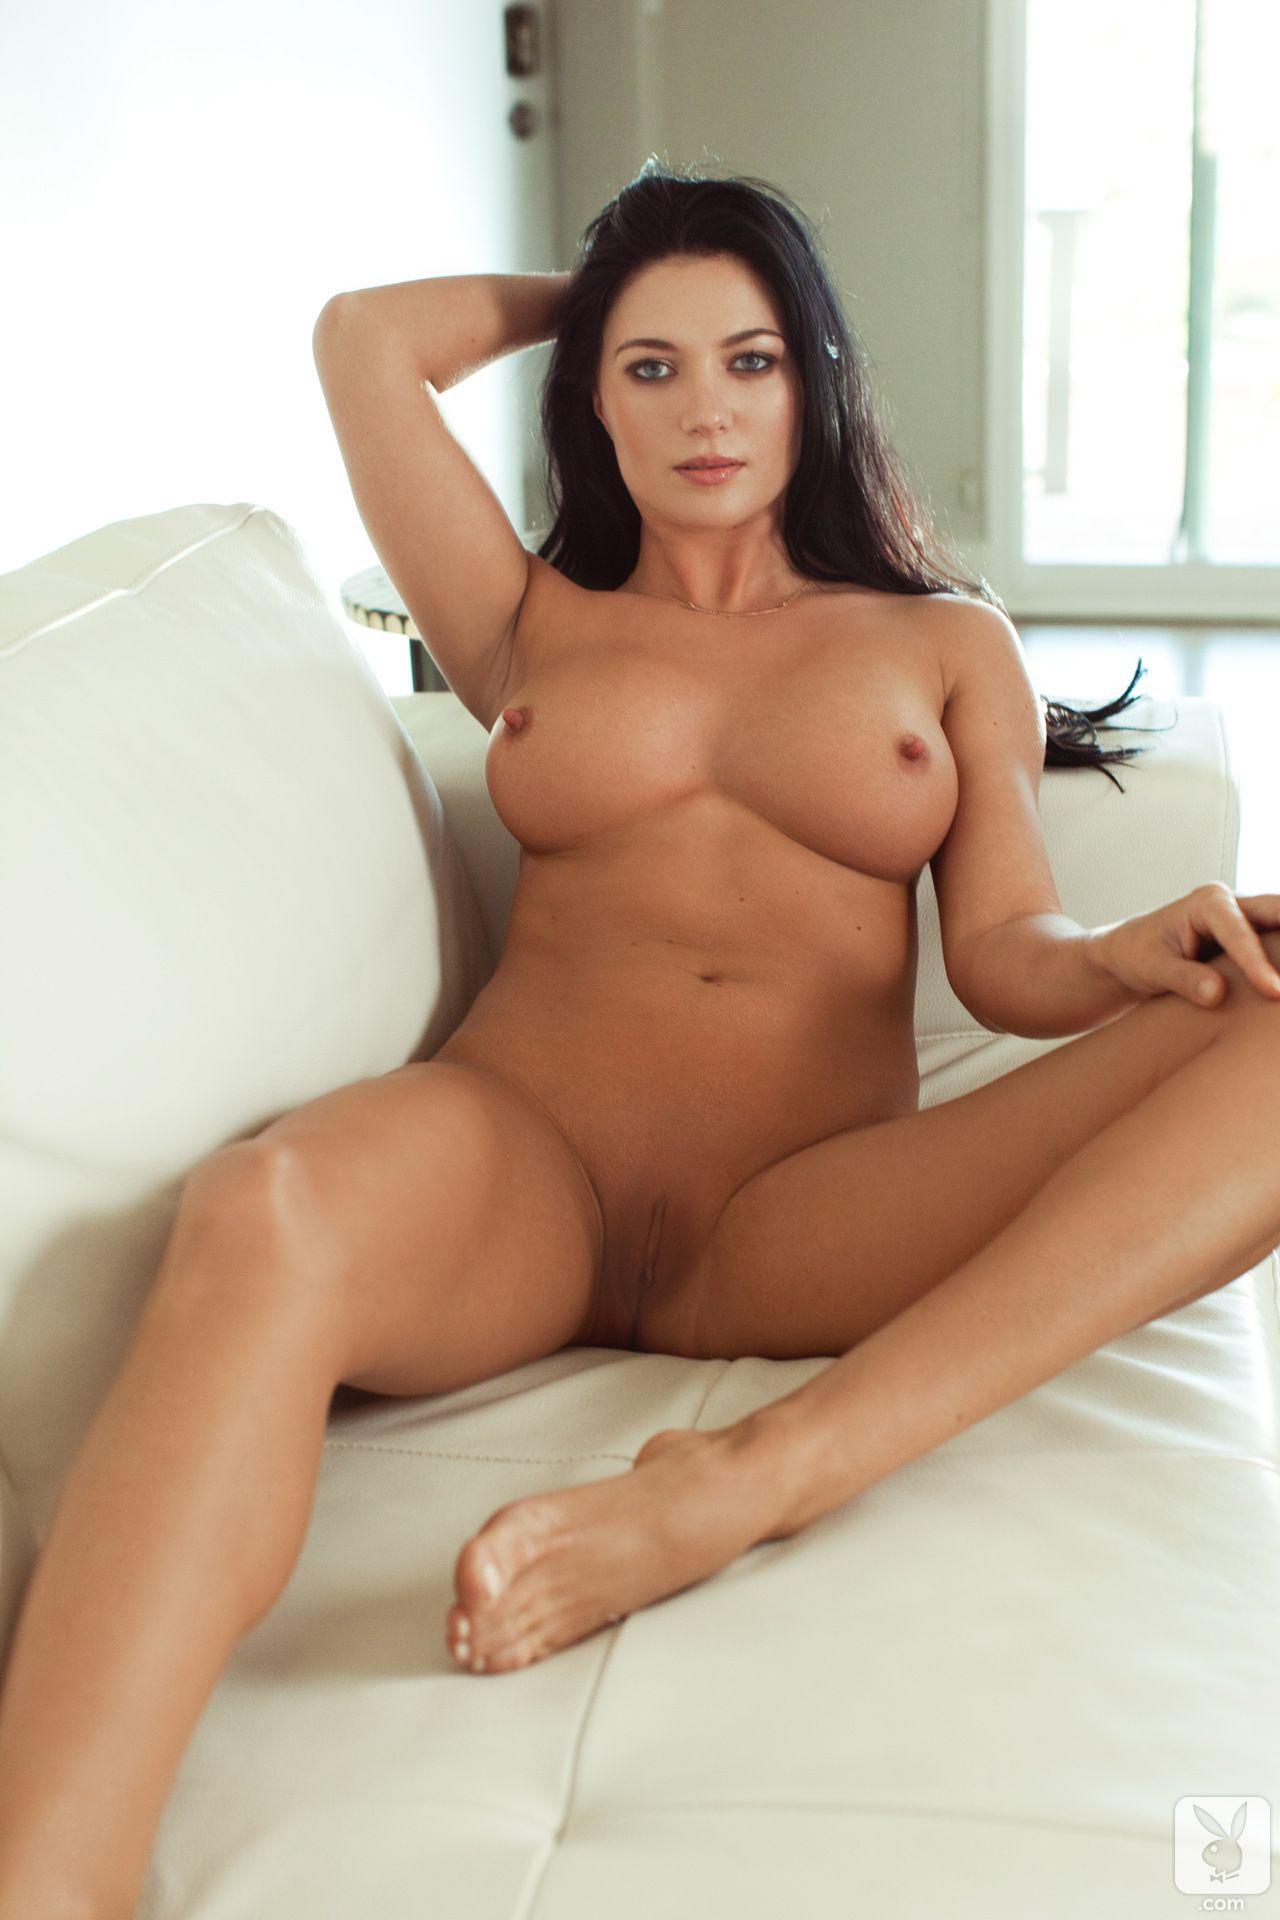 Vembvej 17 hotteste pornostjerne